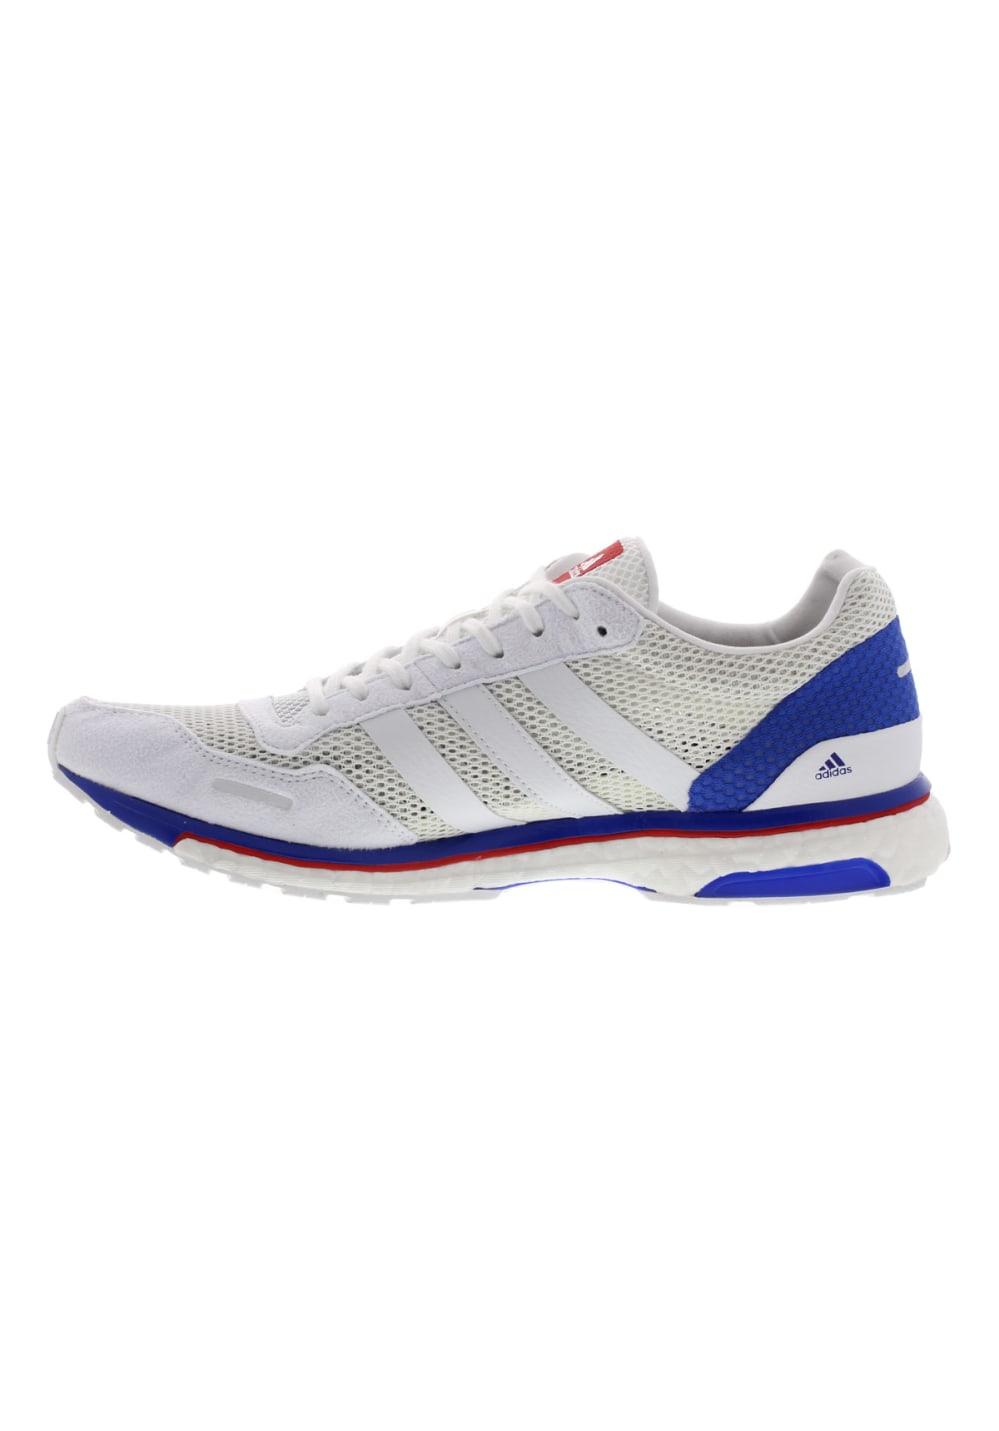 Adidas 3 Running Chaussures Adizero Aktiv Adios Gris pUVLGjqSzM